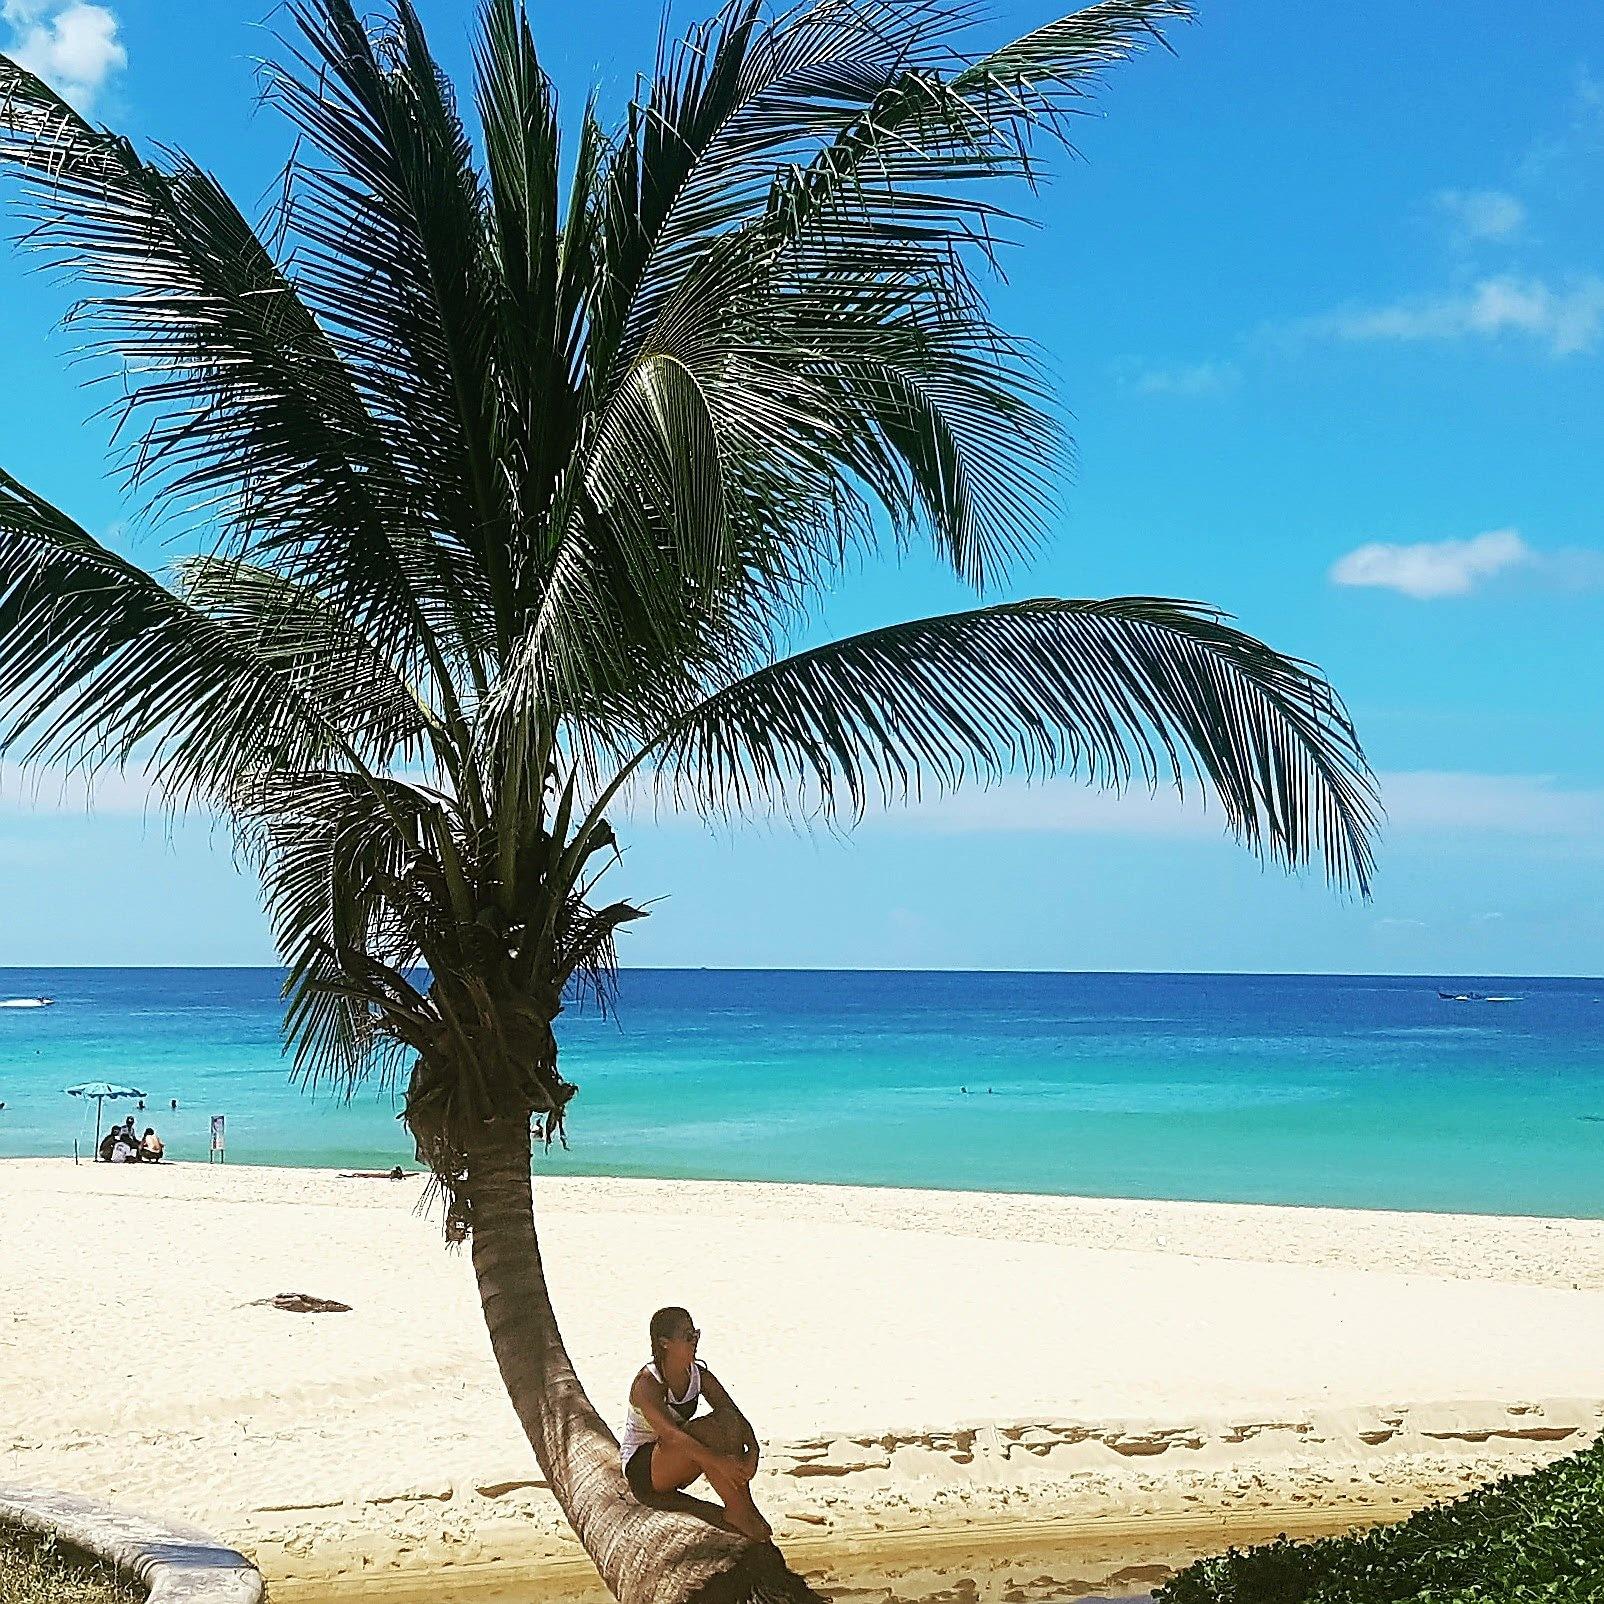 Karon beach Thailand by amalia